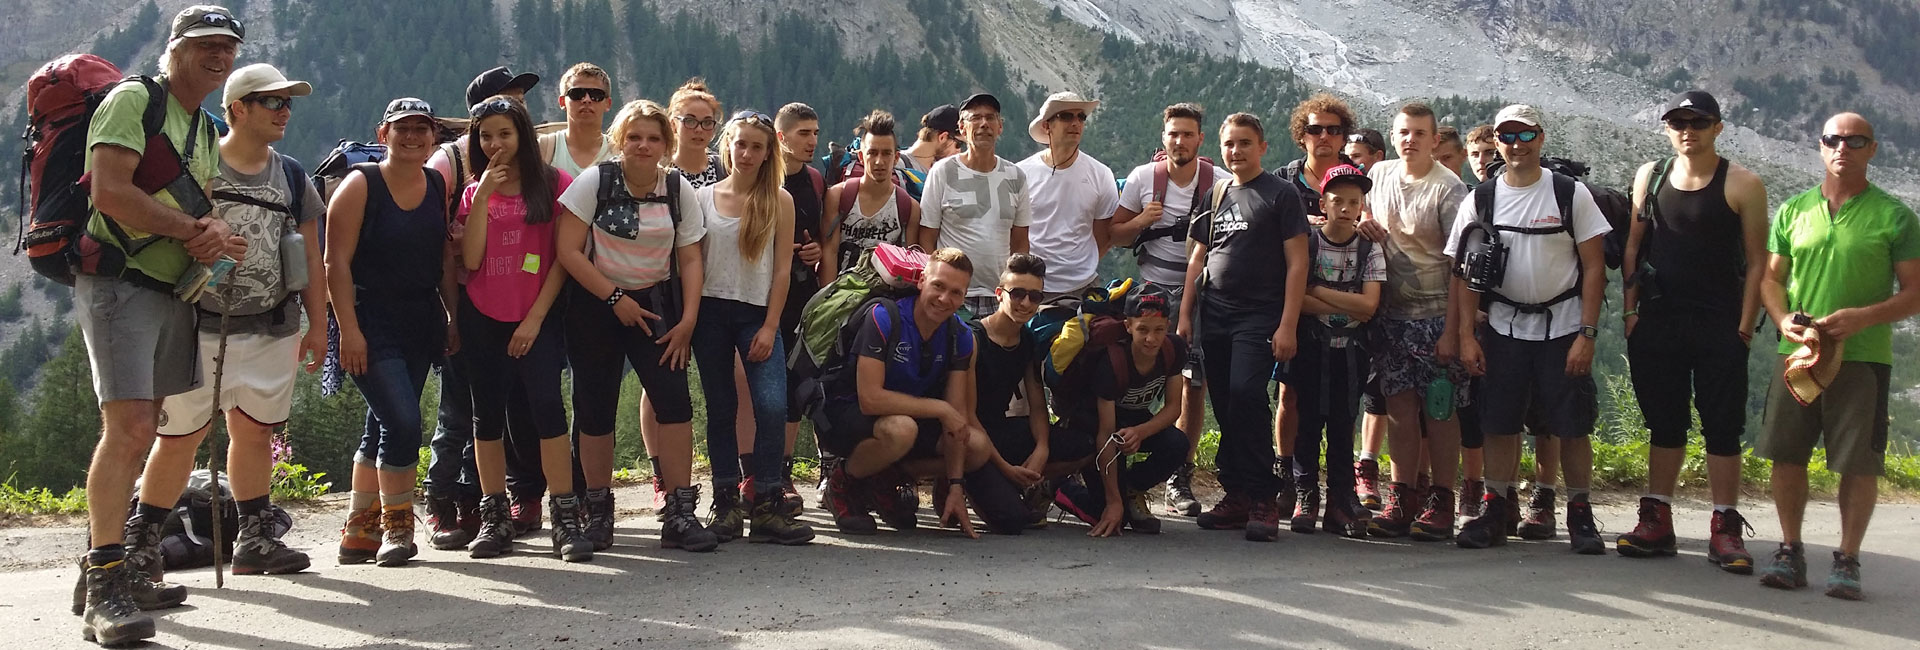 Ecole d'aventure jeunes